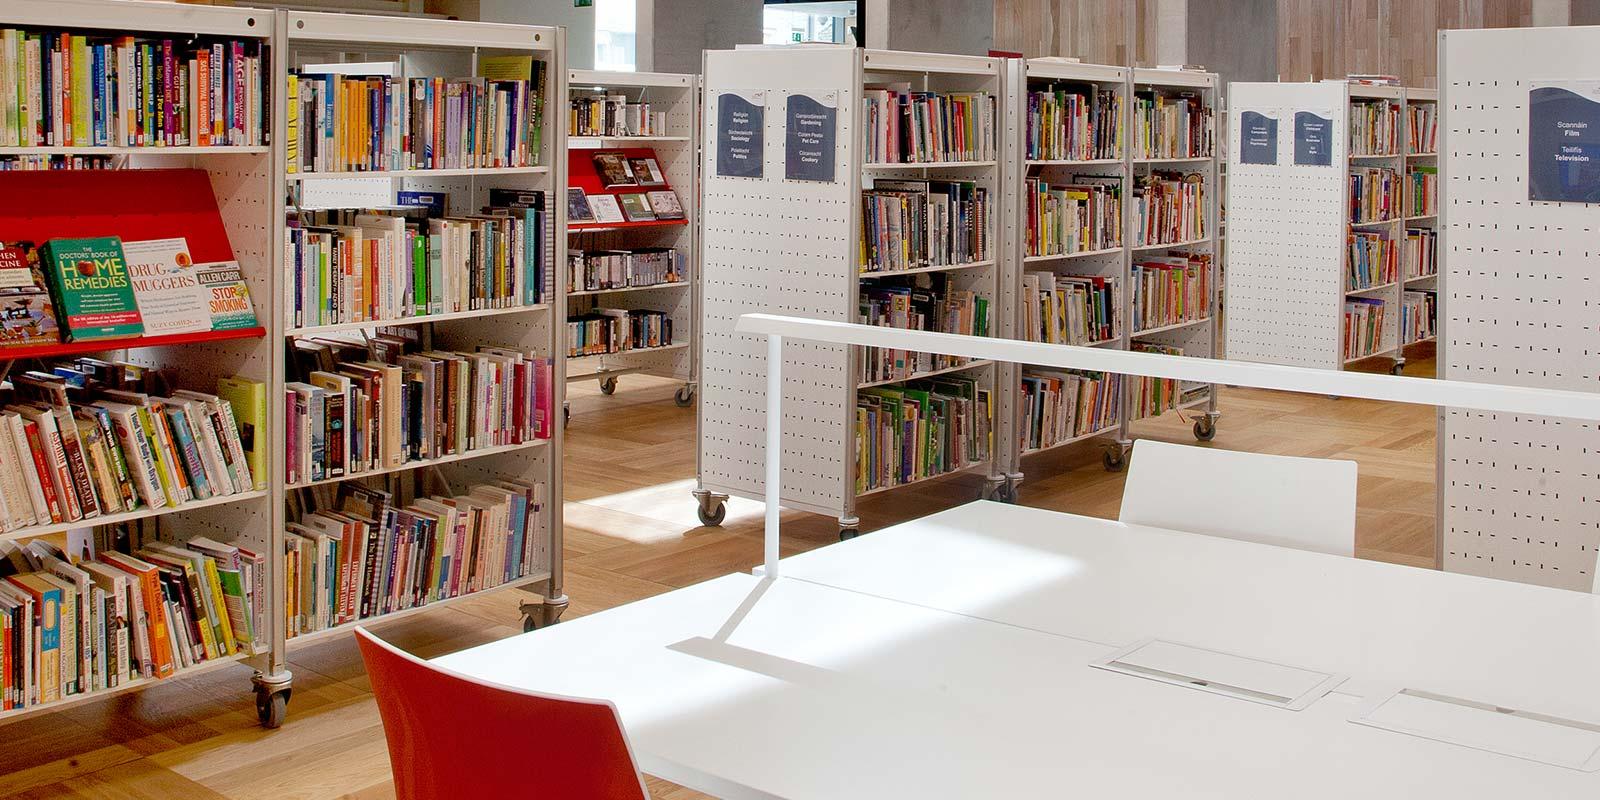 Ballyroan Library 2